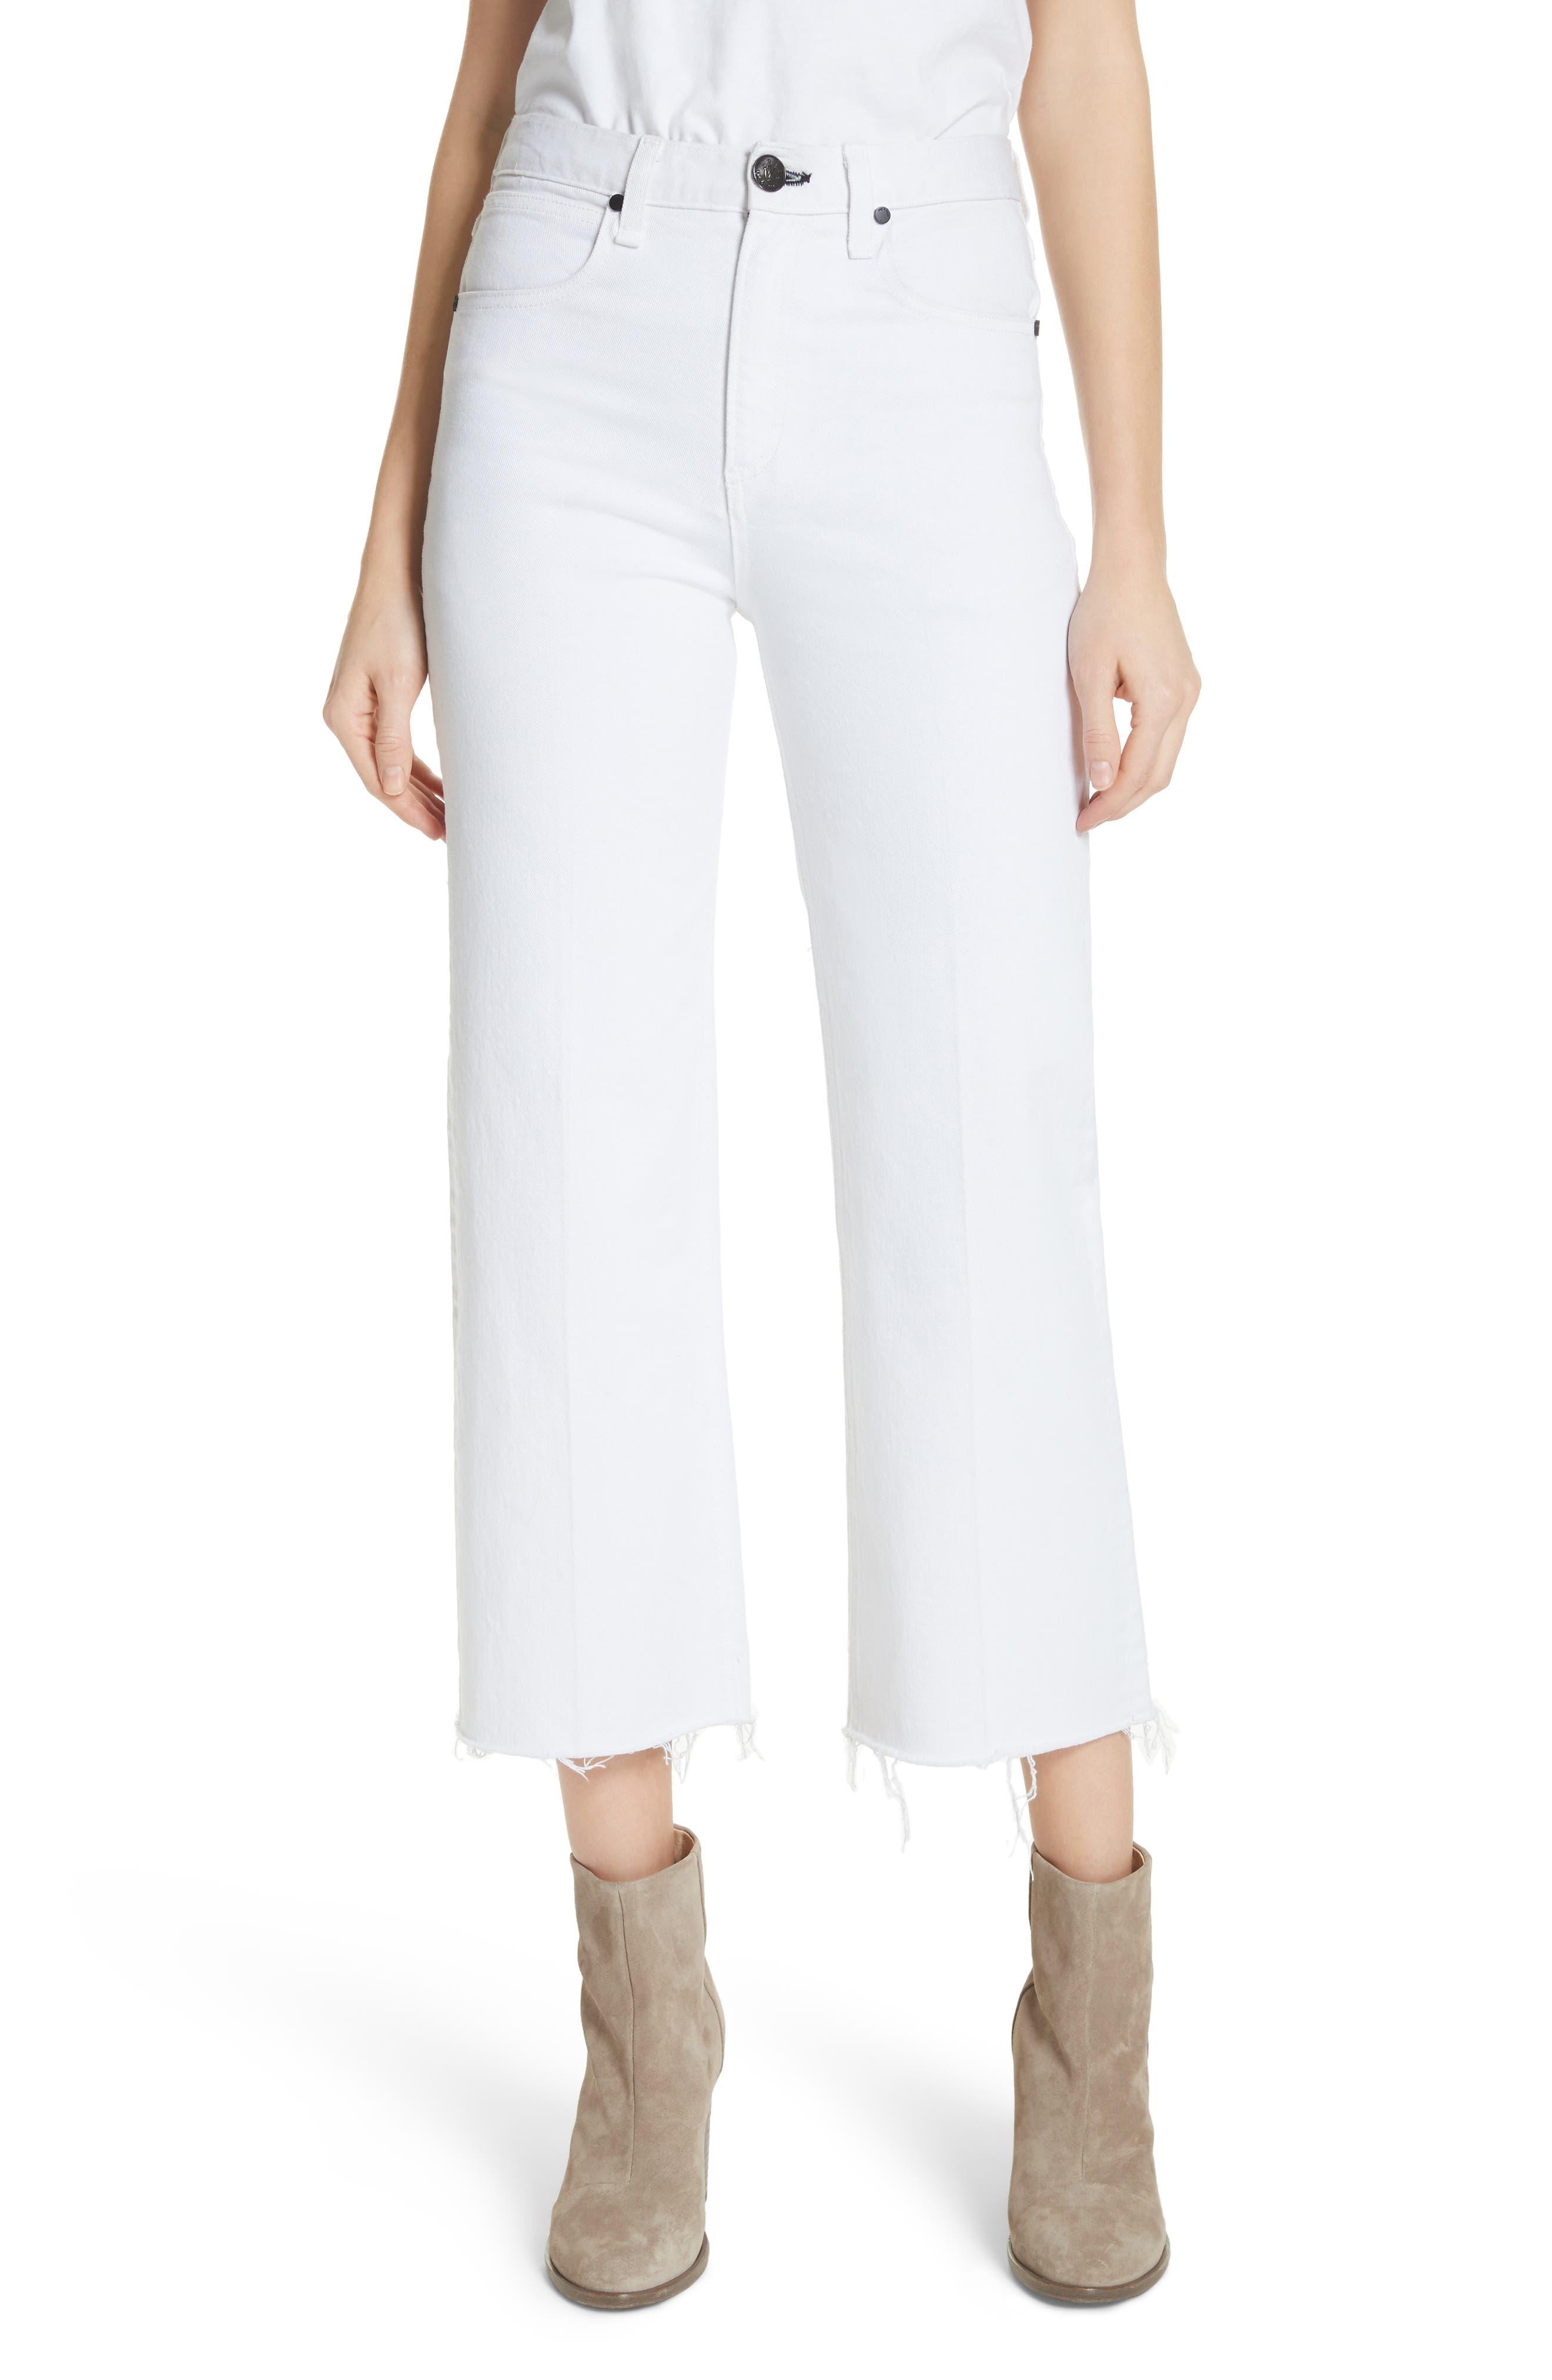 Justine High Waist Ankle Wide Leg Trouser Jeans,                             Main thumbnail 1, color,                             100